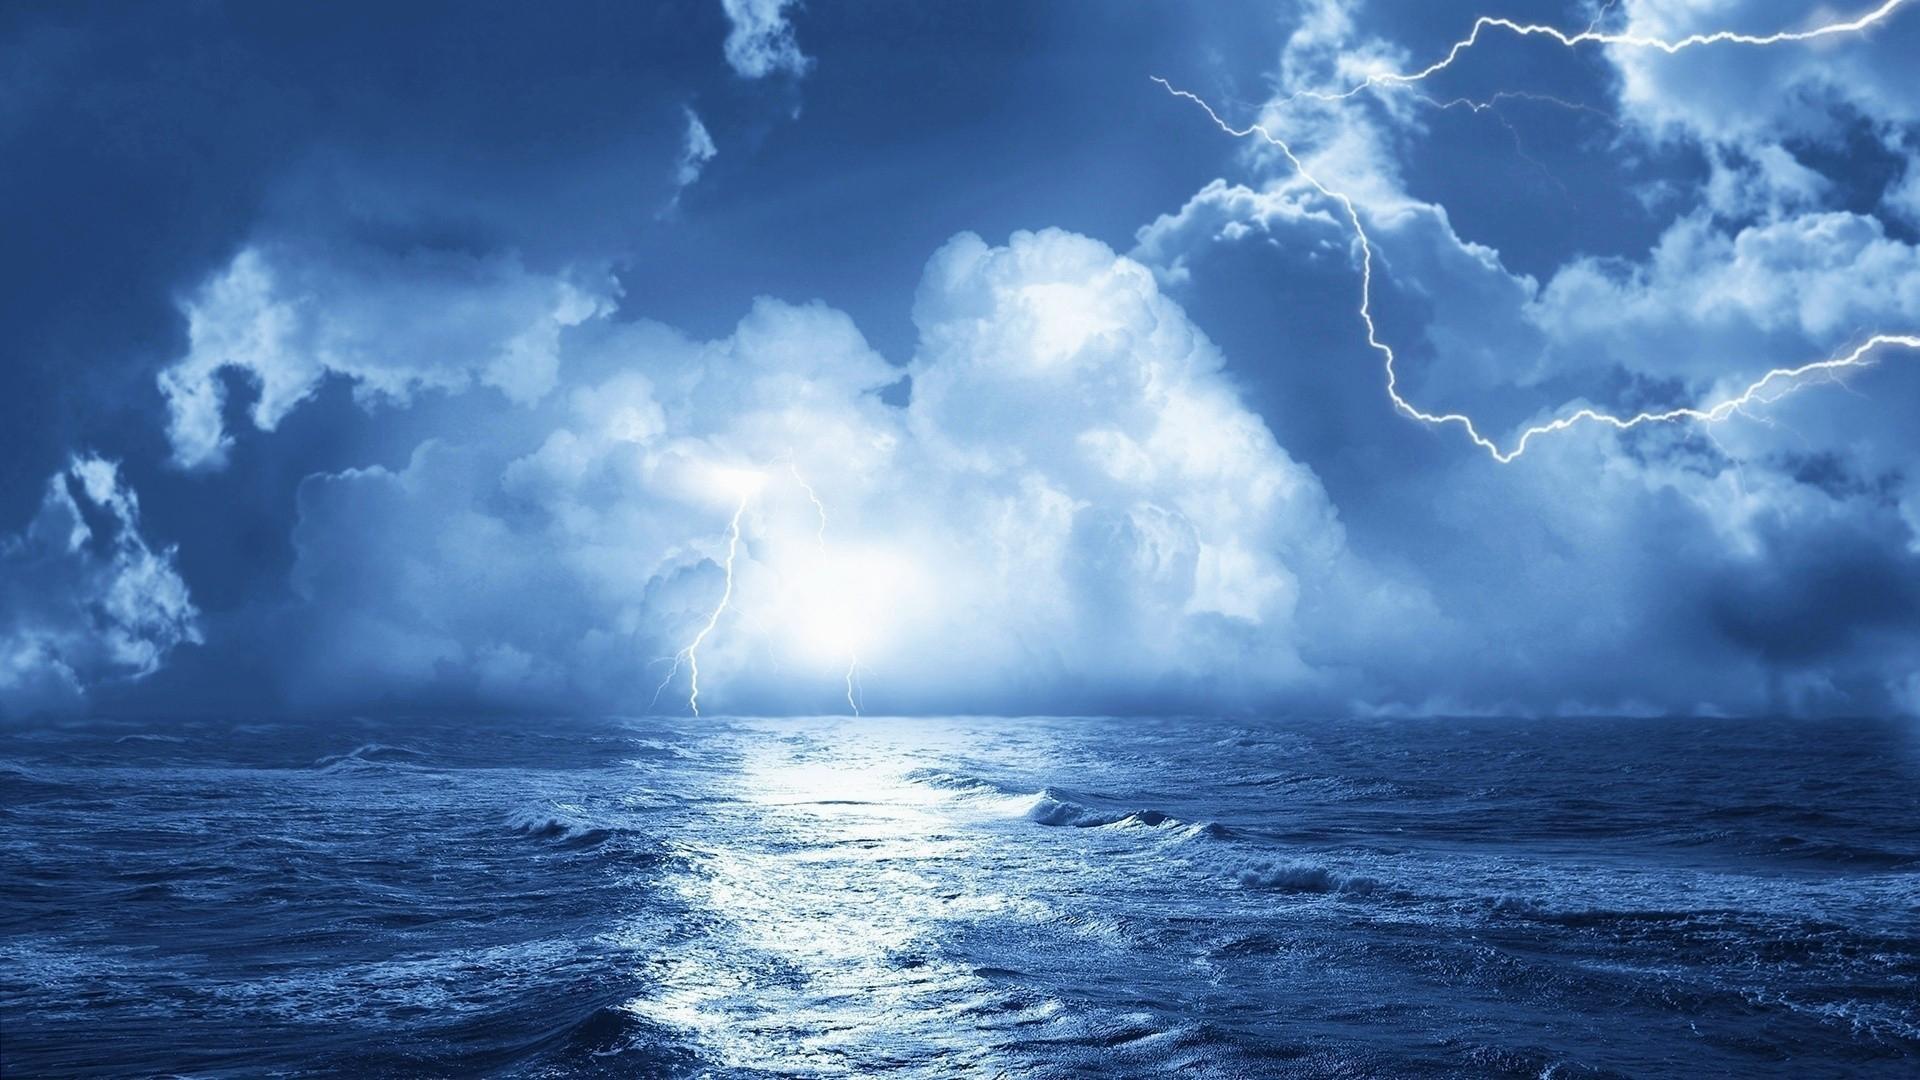 Fish-in-the-ocean-wallpapers-HD-sea-lightning